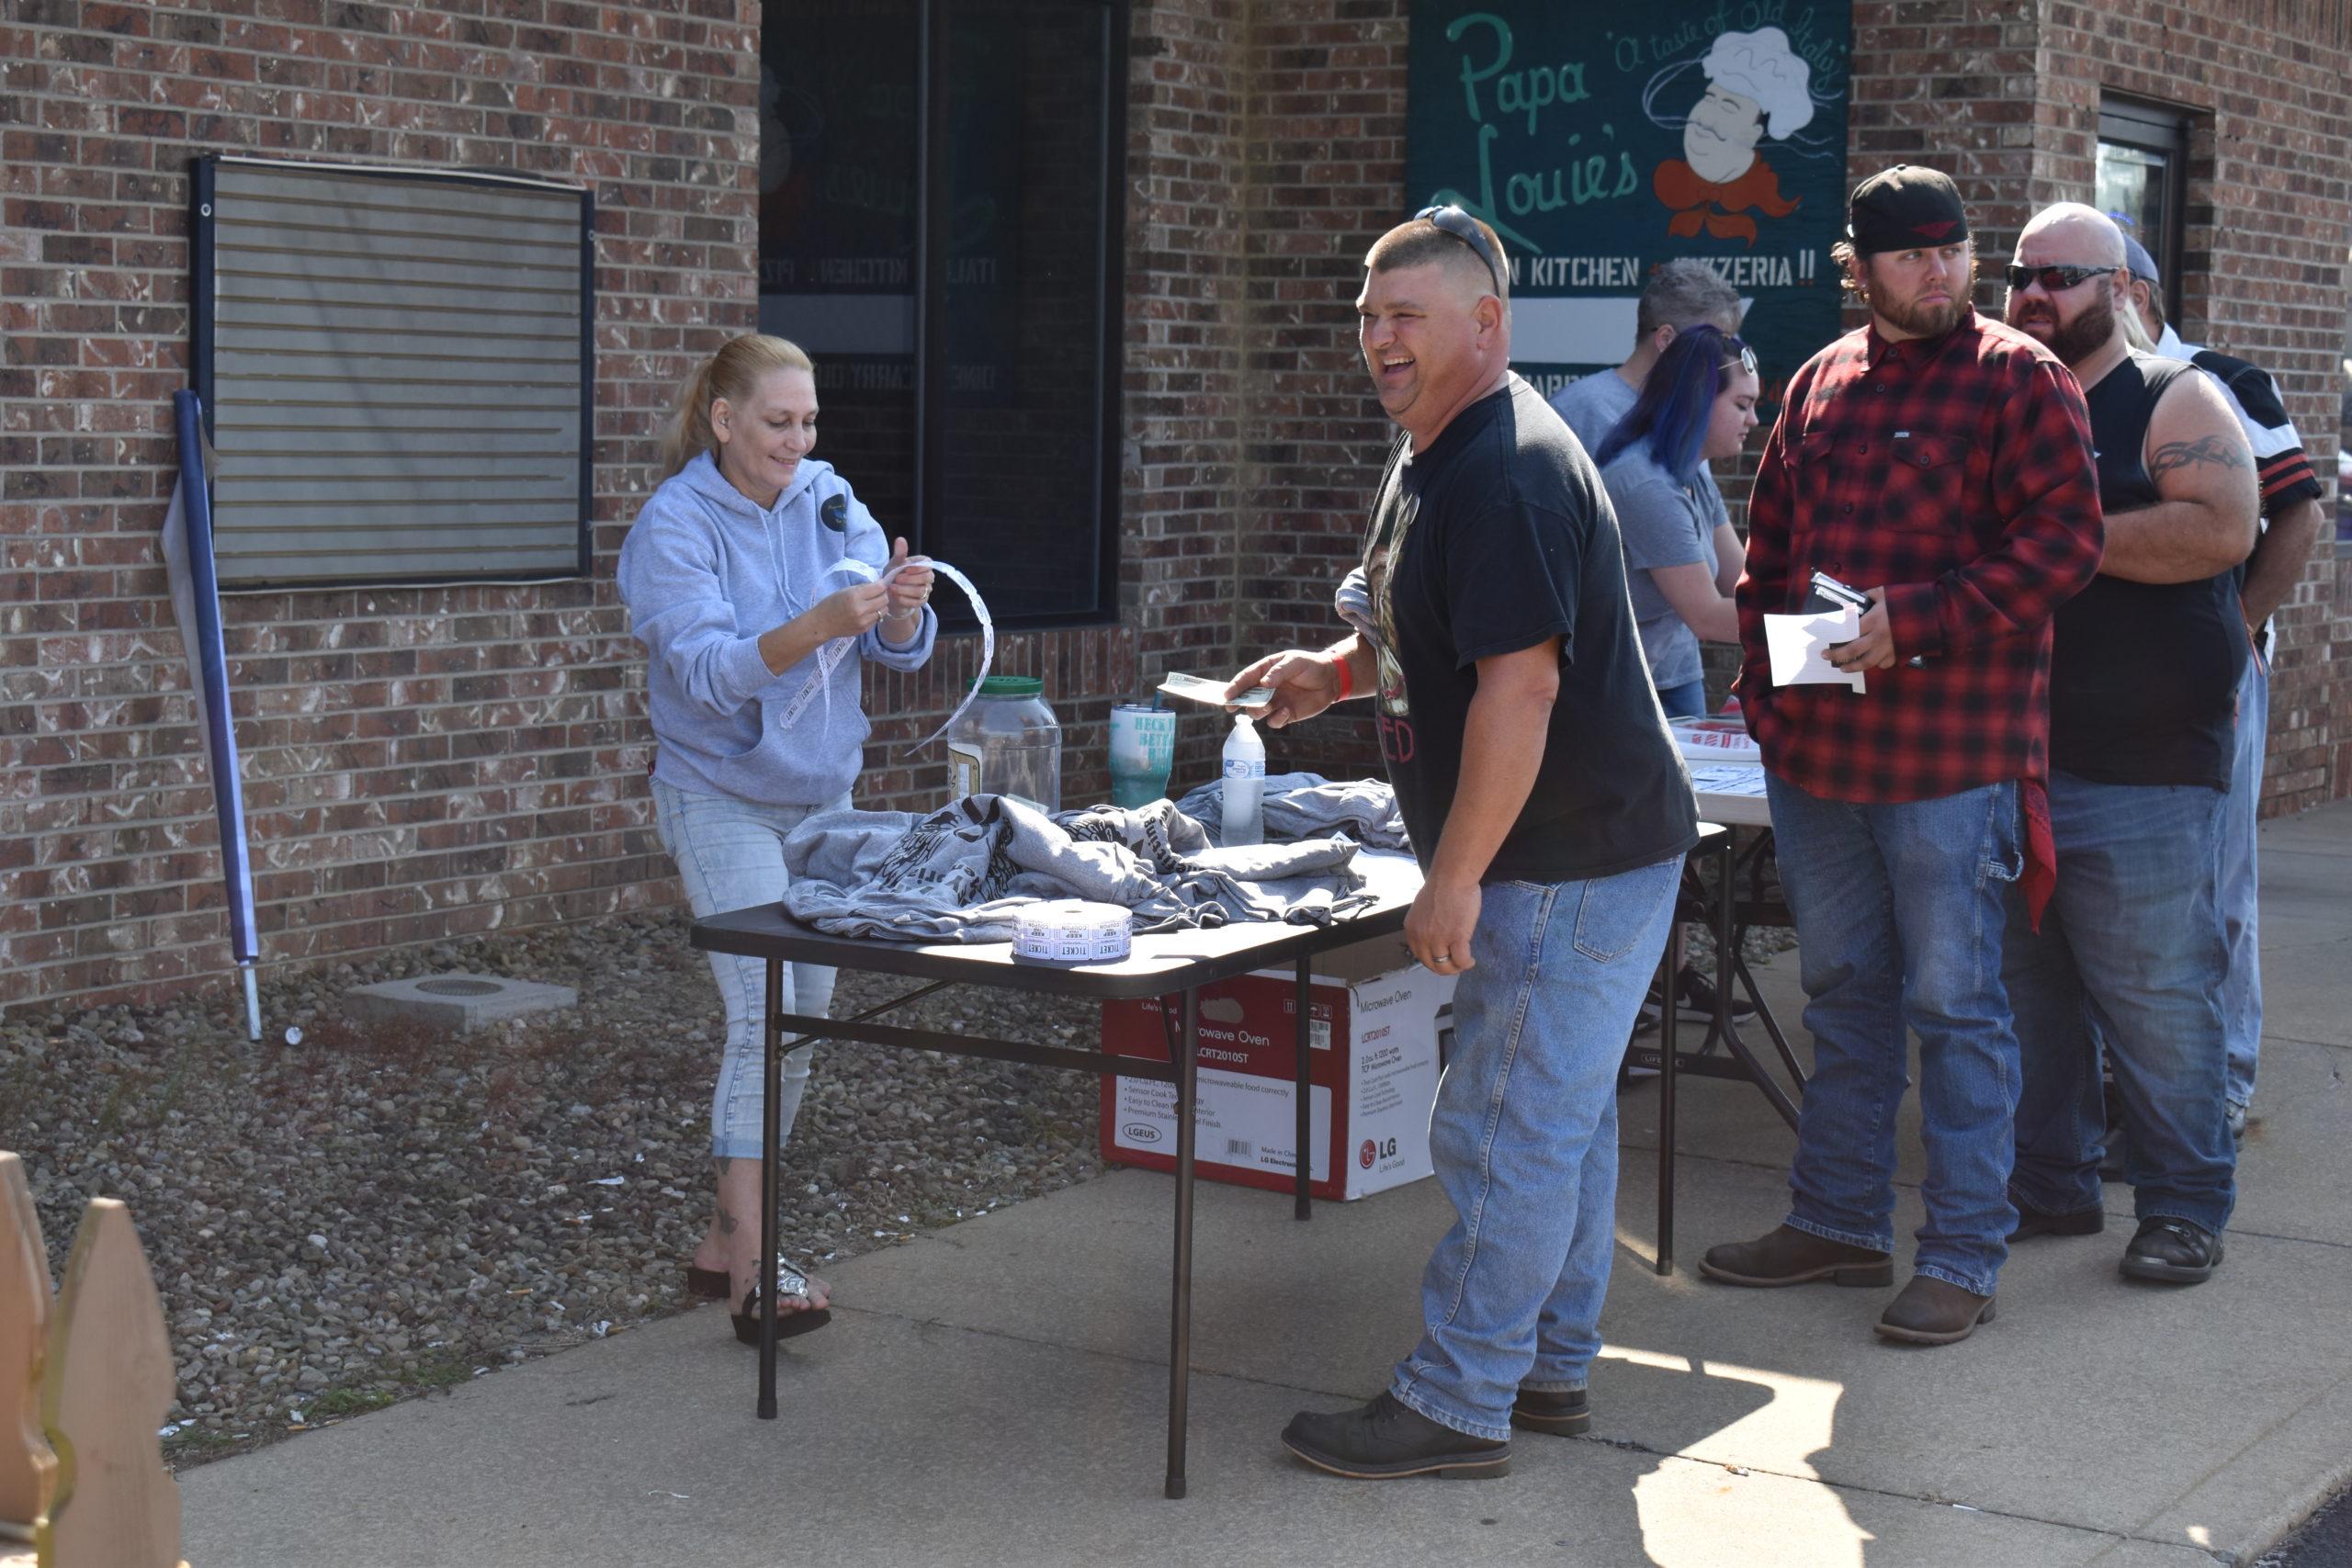 Kimberly King, left, sells raffle tickets.